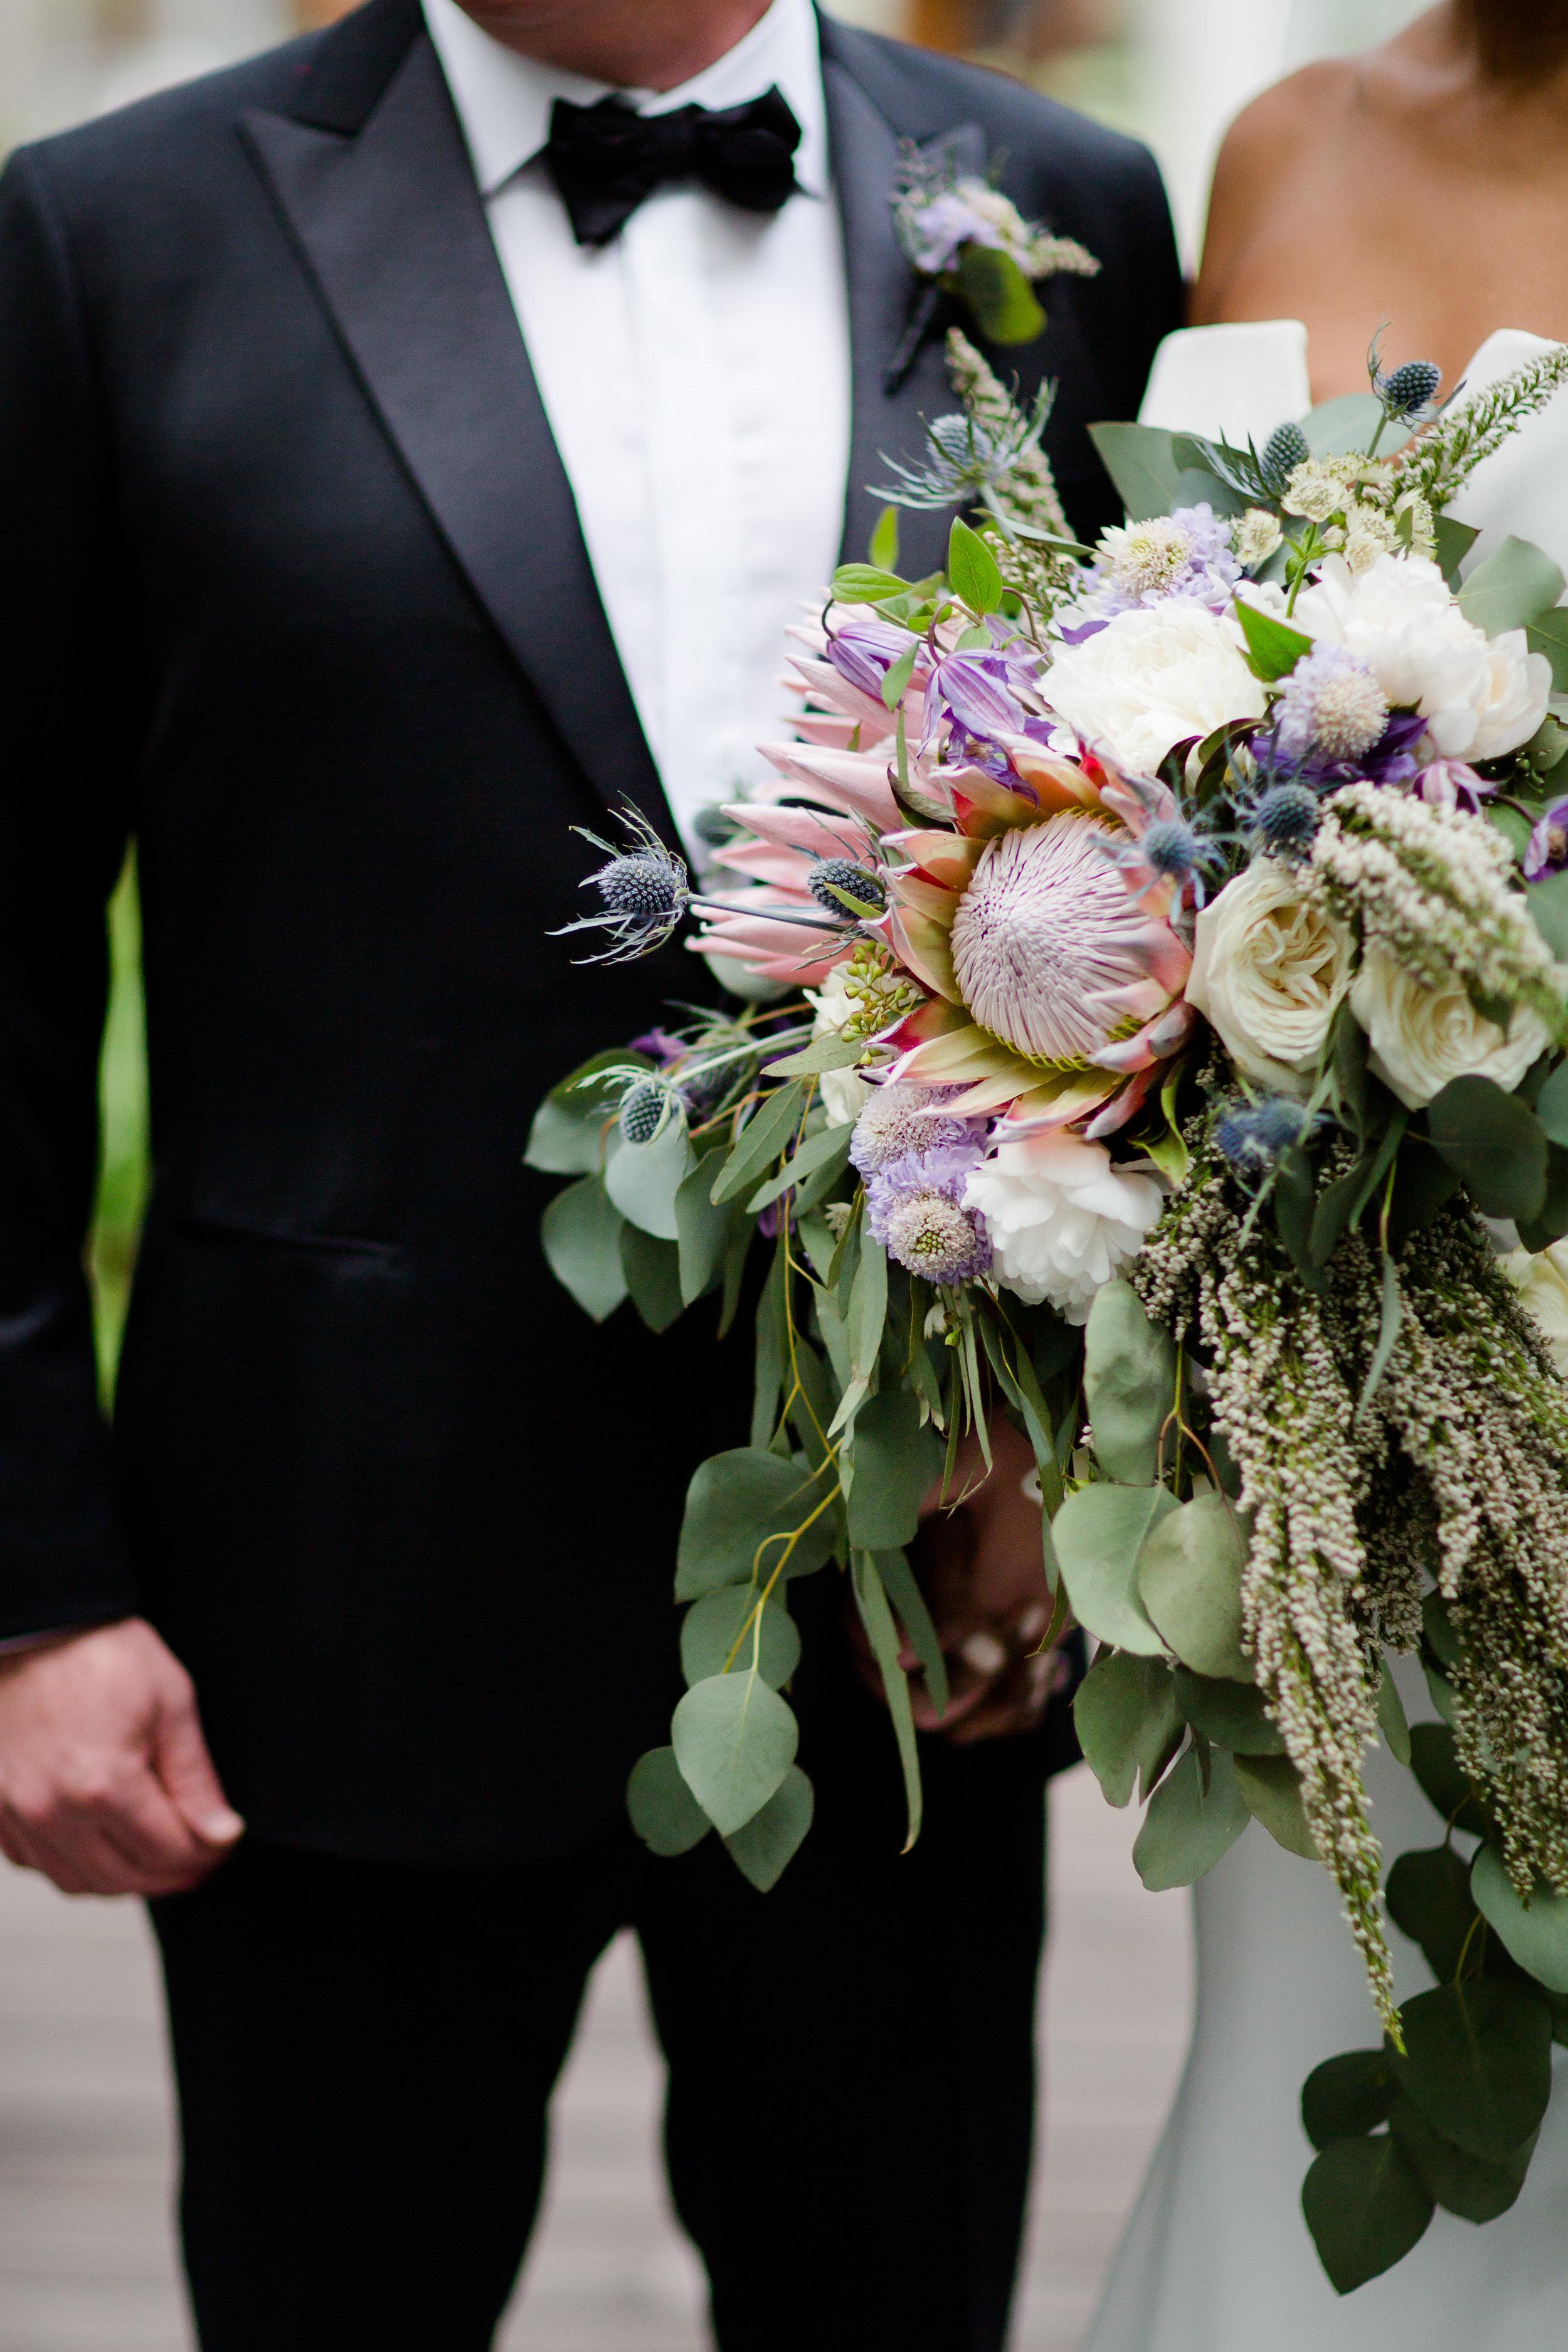 Design & Floral:    Kehoe Designs    | Lighting & Sound:    BlackOak Technical Productions    | Photo:    Studio This Is Photography    | Planning:    Big City Bride    | Venue:    Art Institute of Chicago